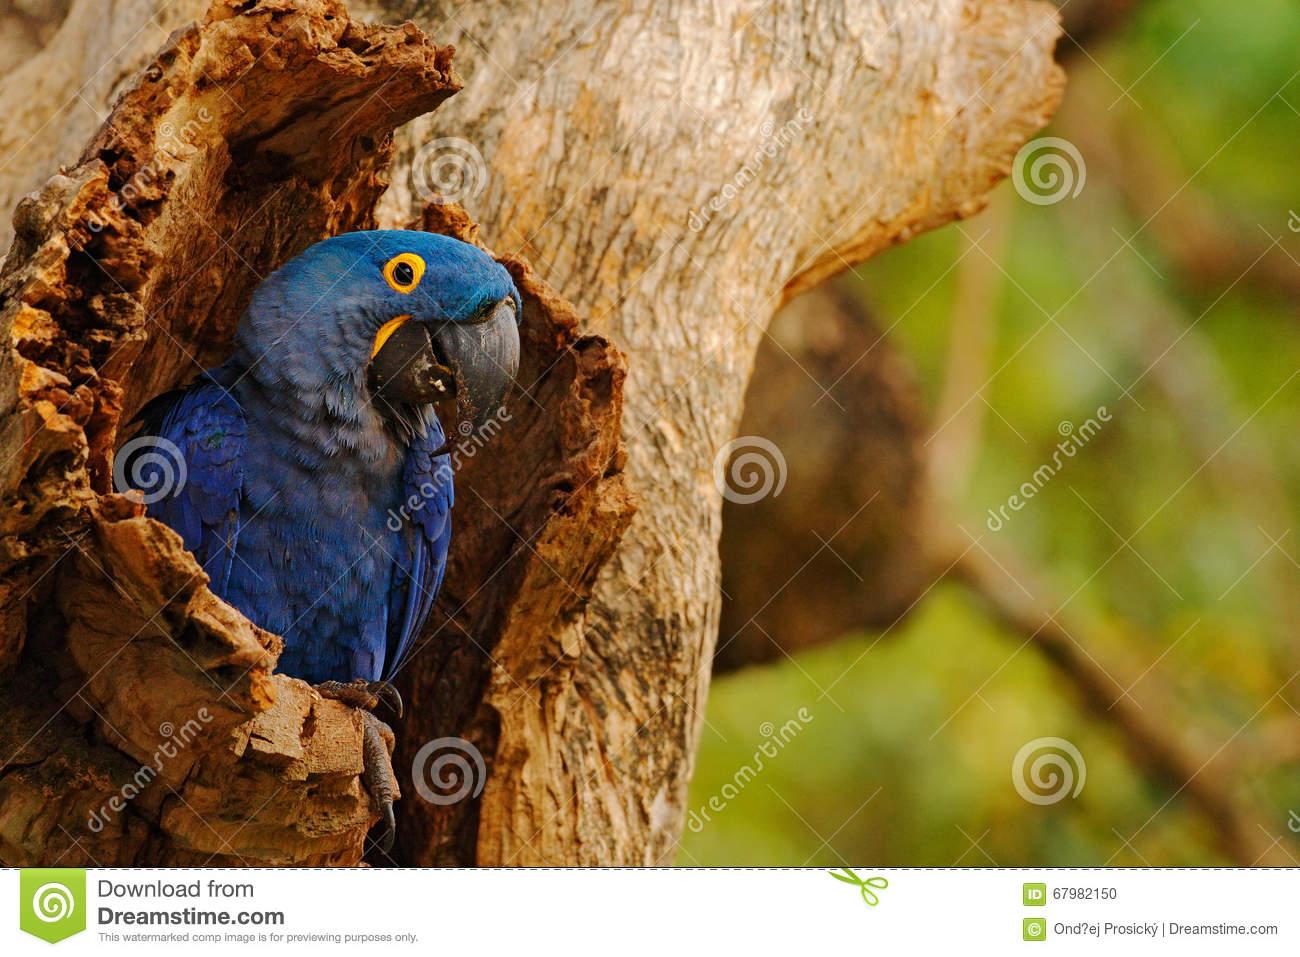 Big Blue Parrot Hyacinth Macaw, Anodorhynchus Hyacinthinus, In.